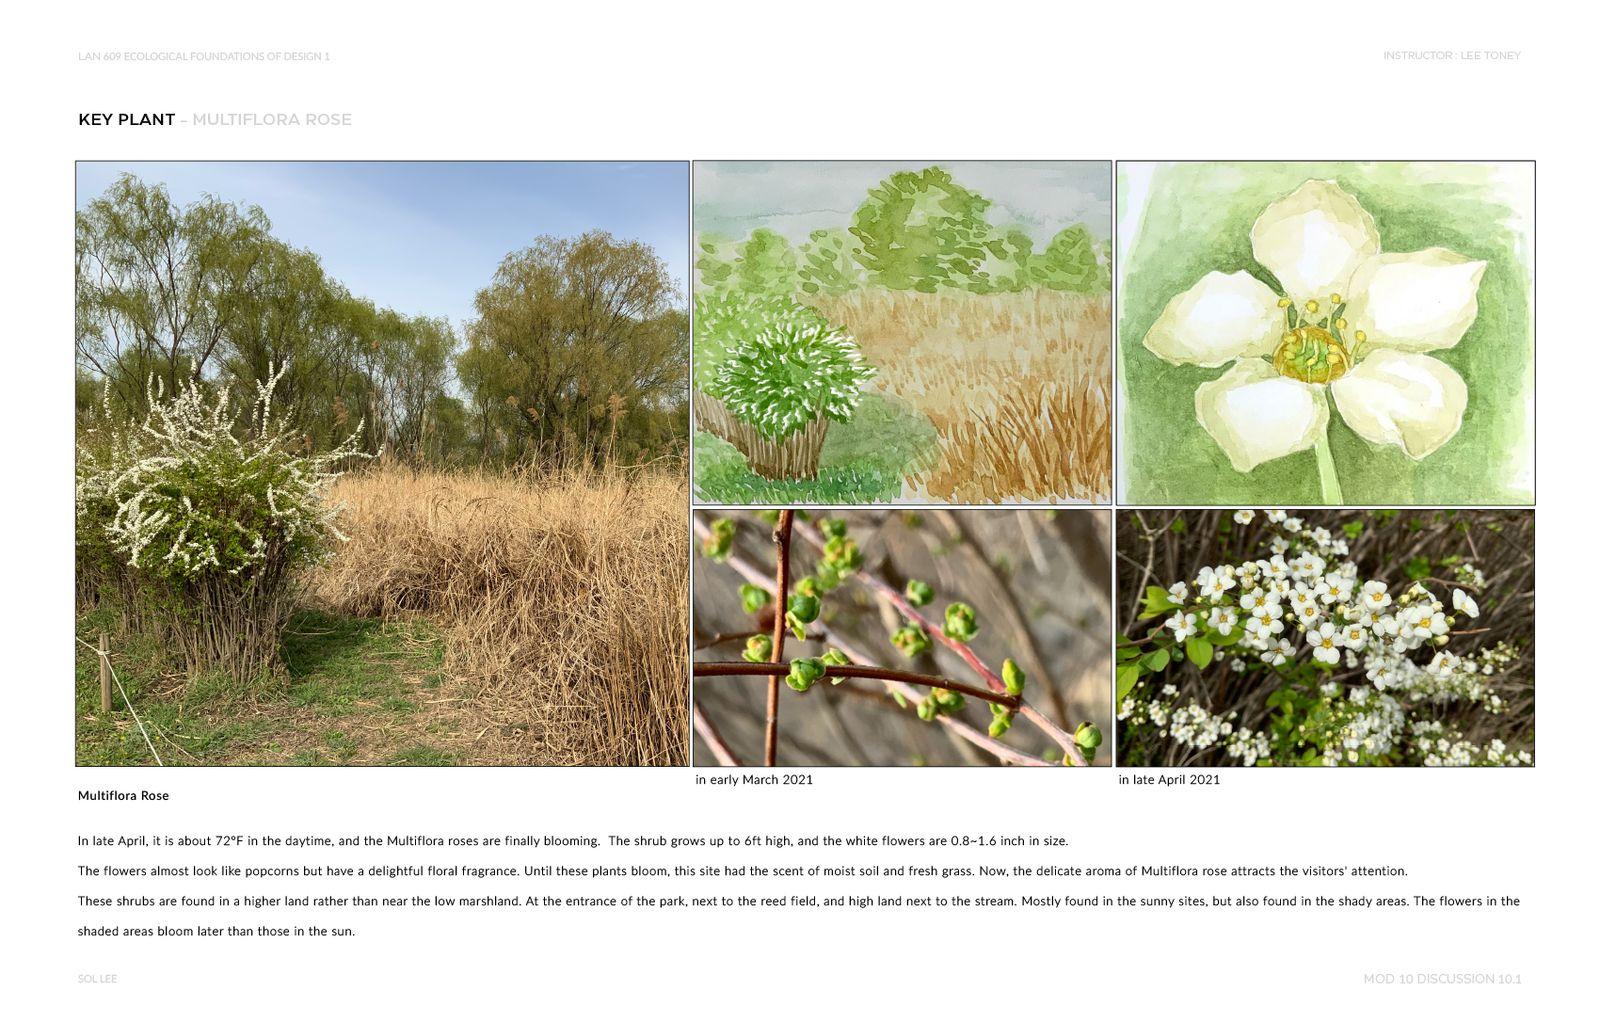 Gangseo Wet Ecology Park - Key Plant - Multiflora Rose